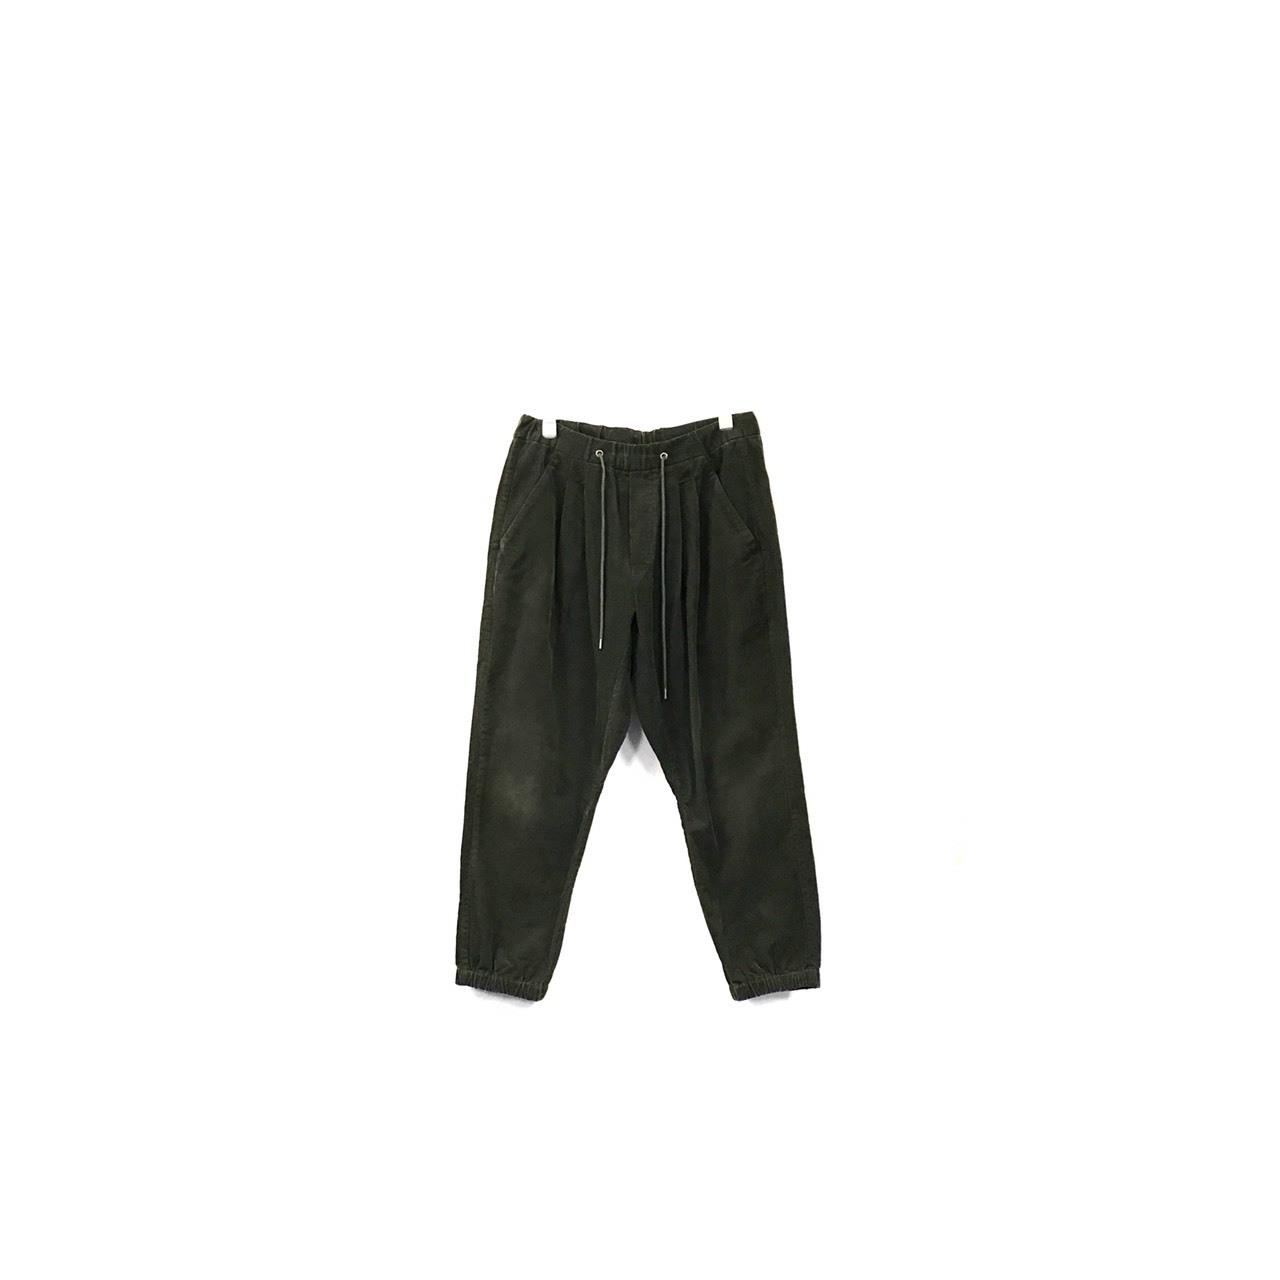 TROVE - Corduroy Tack Pants ¥12000+tax